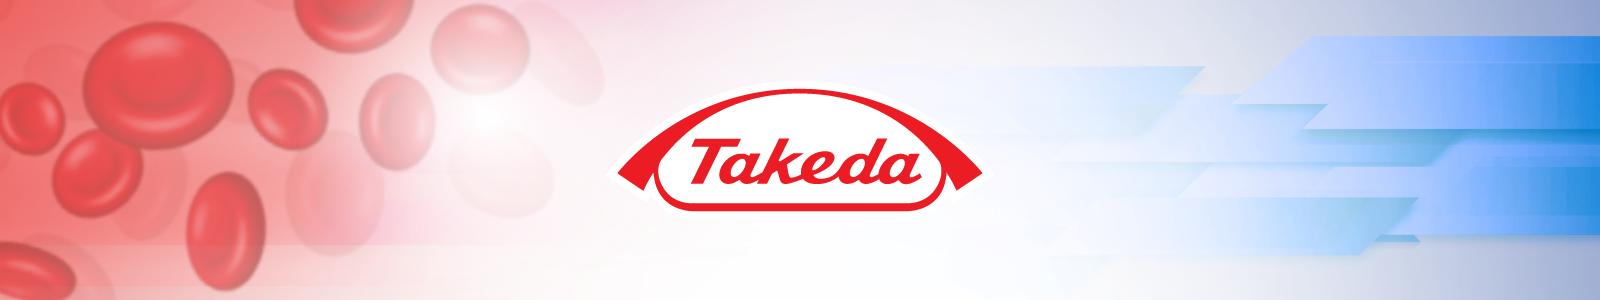 Diacordis2021-BANNER-takeda